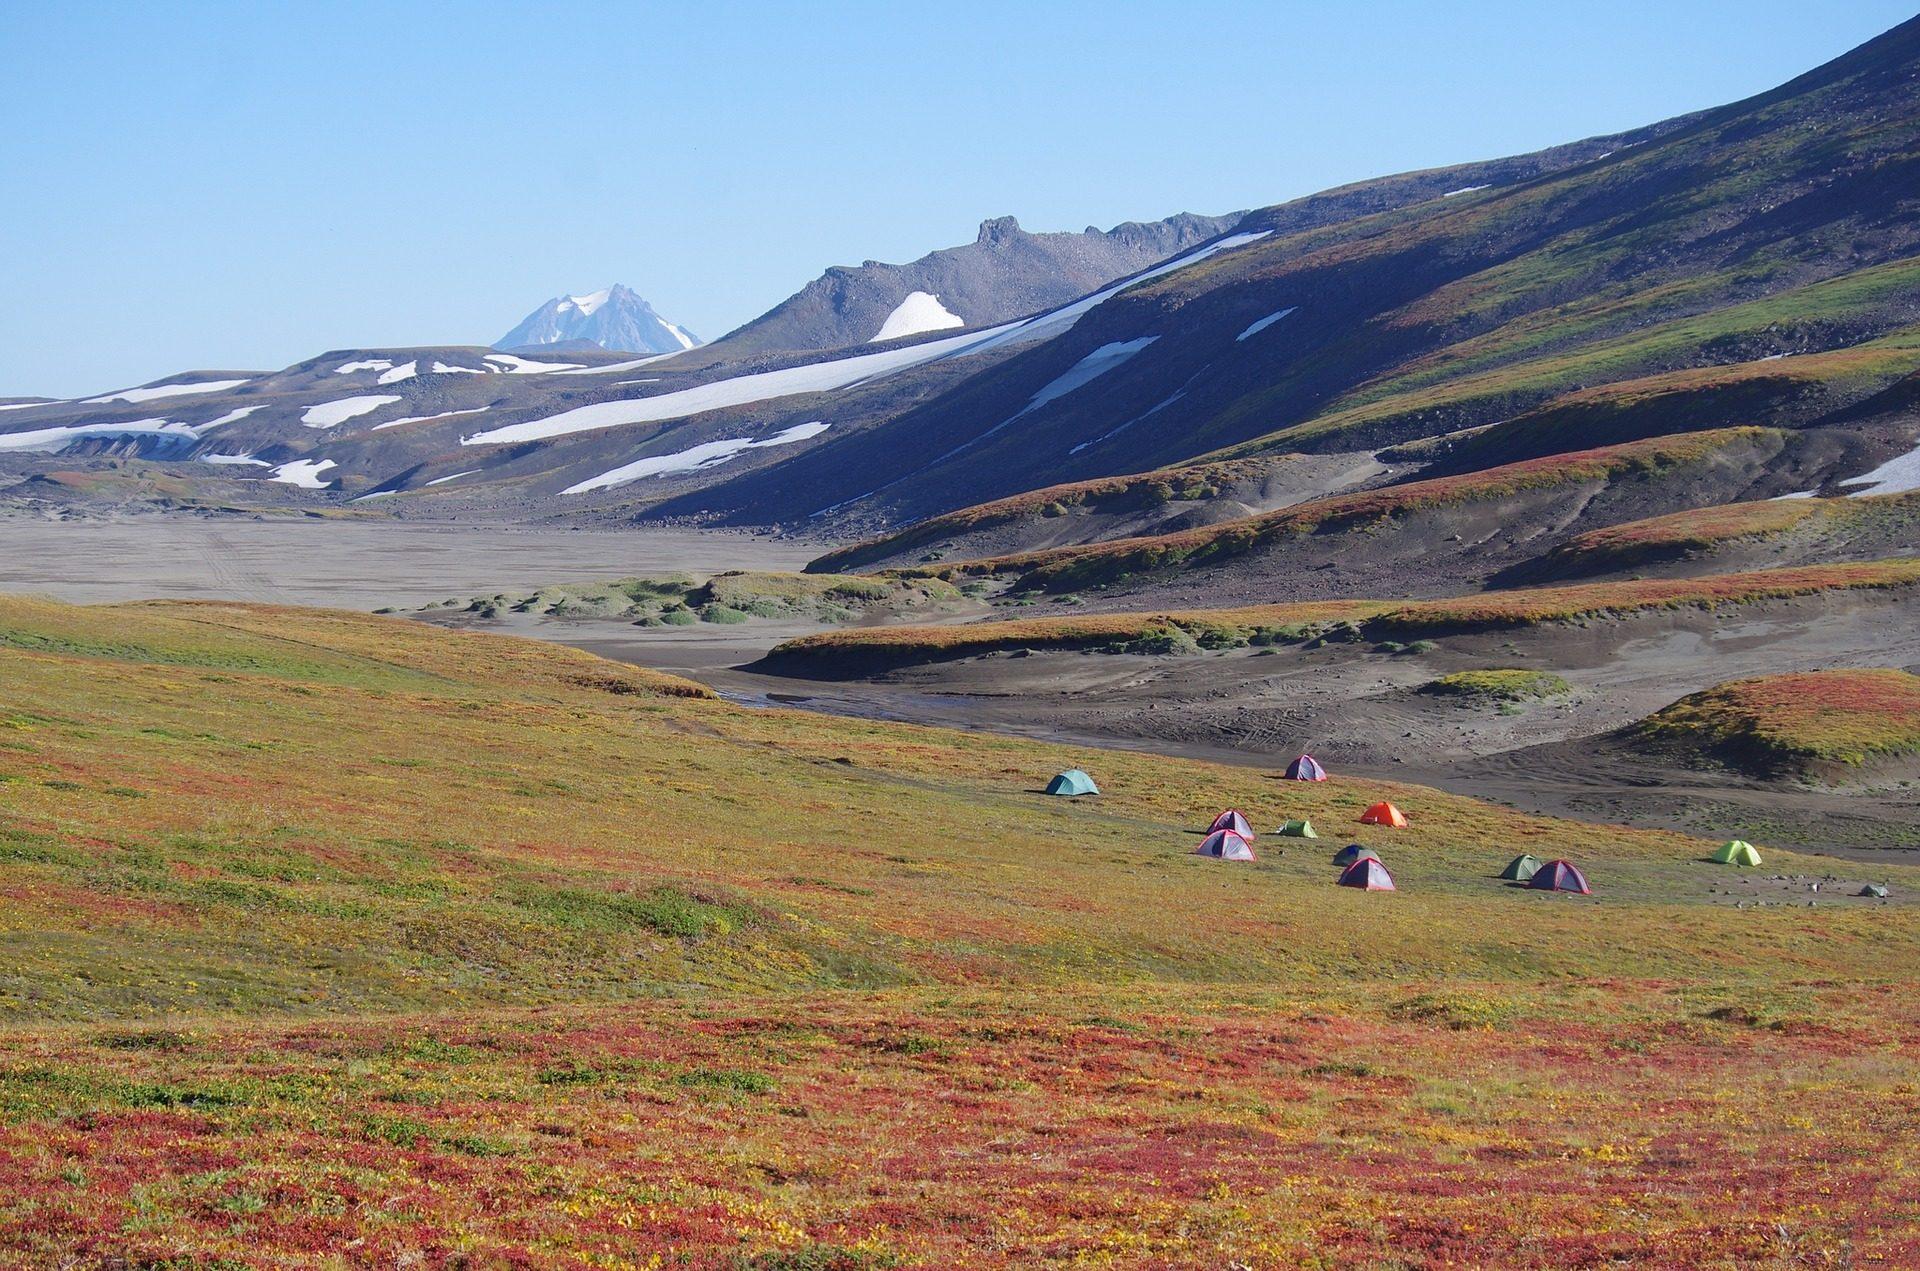 Montañas, Geschäfte, Camping, Hügel, Expedition - Wallpaper HD - Prof.-falken.com